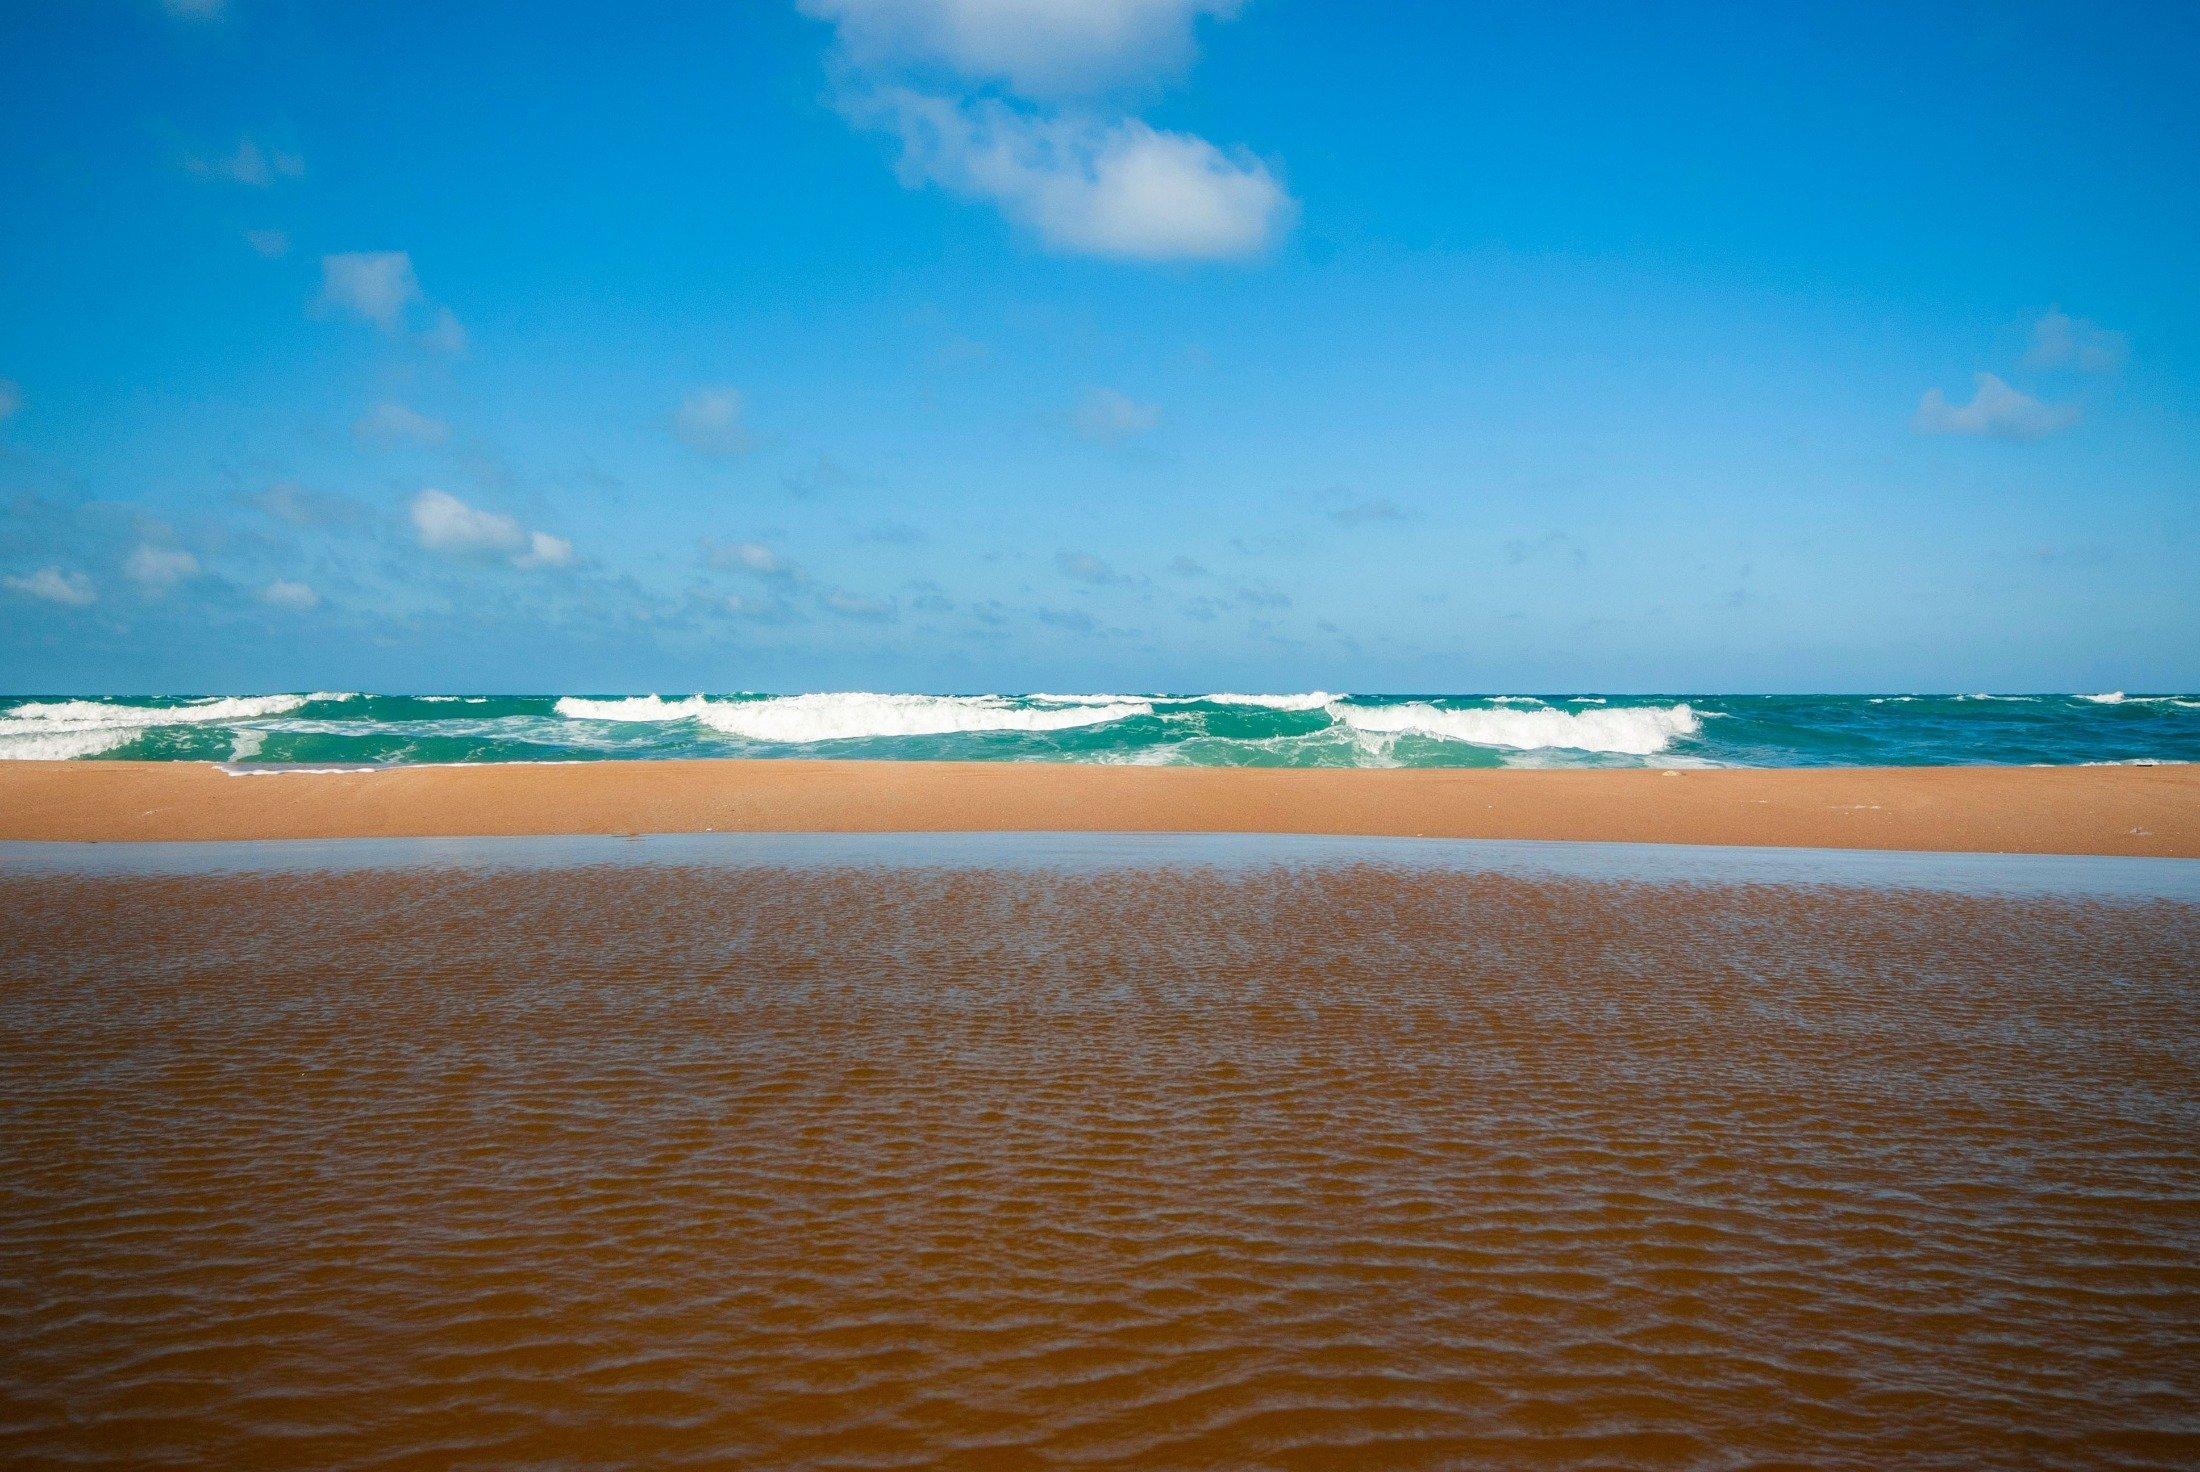 Waves wash across the beautiful sandy Castro beach of Tekirdağ, Turkey. (Shutterstock Photo)